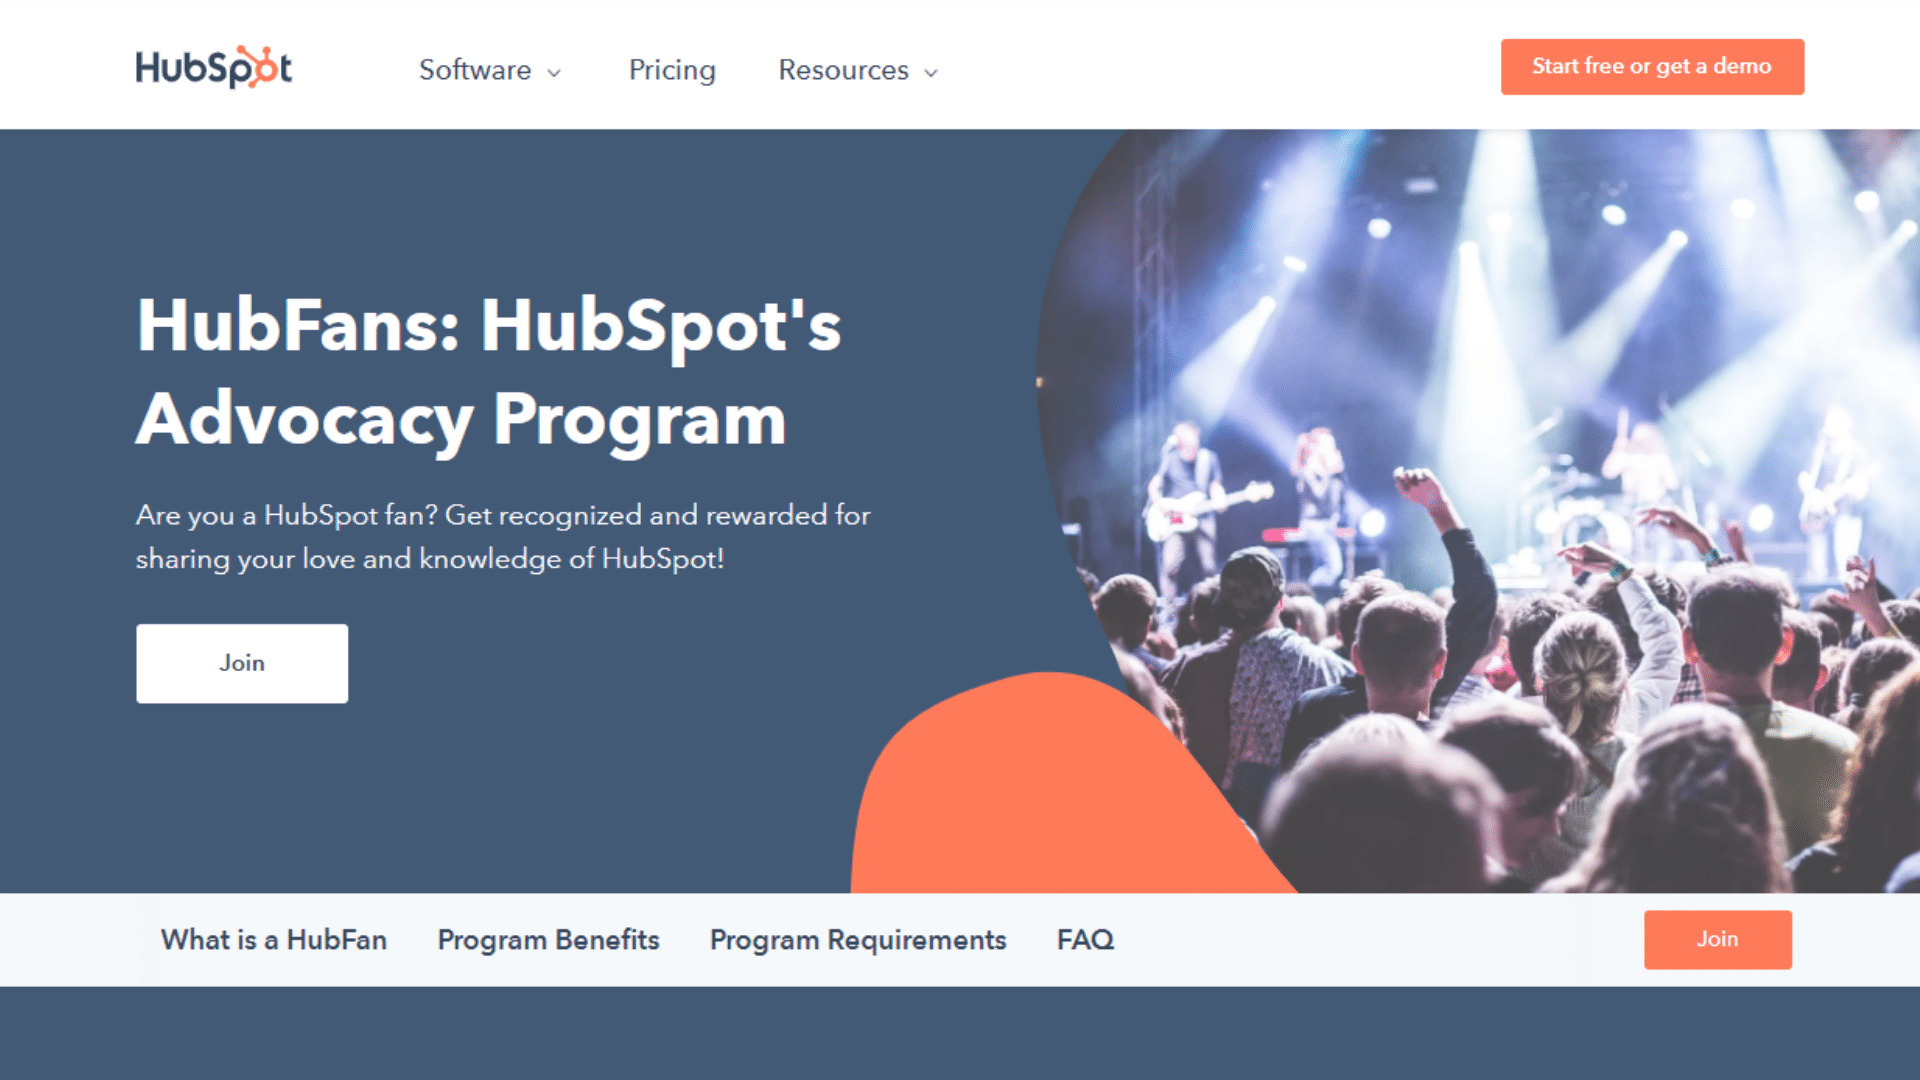 HubFans - HubSpot community advocacy